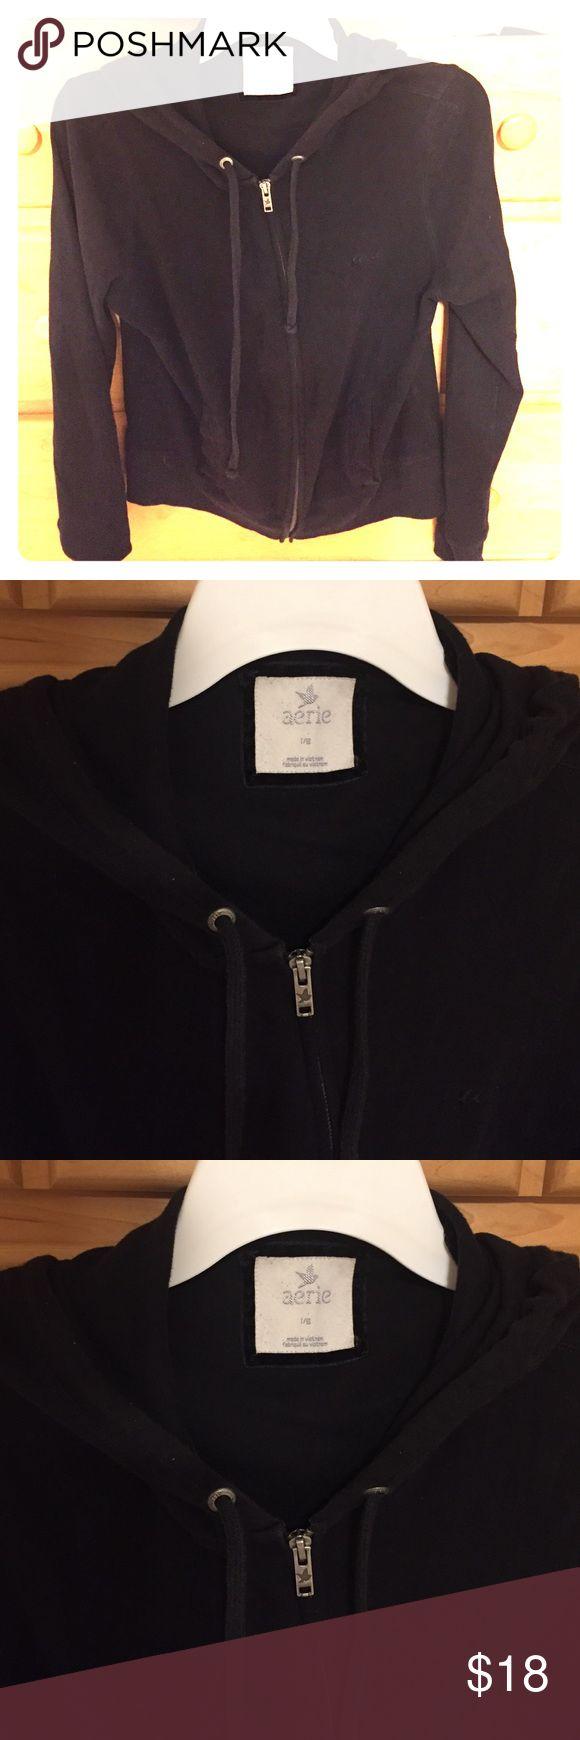 American eagle / Aerie black zip hoodie jacket American eagle / Aerie black zip hoodie jacket w/ drawstrings & pockets aerie Jackets & Coats